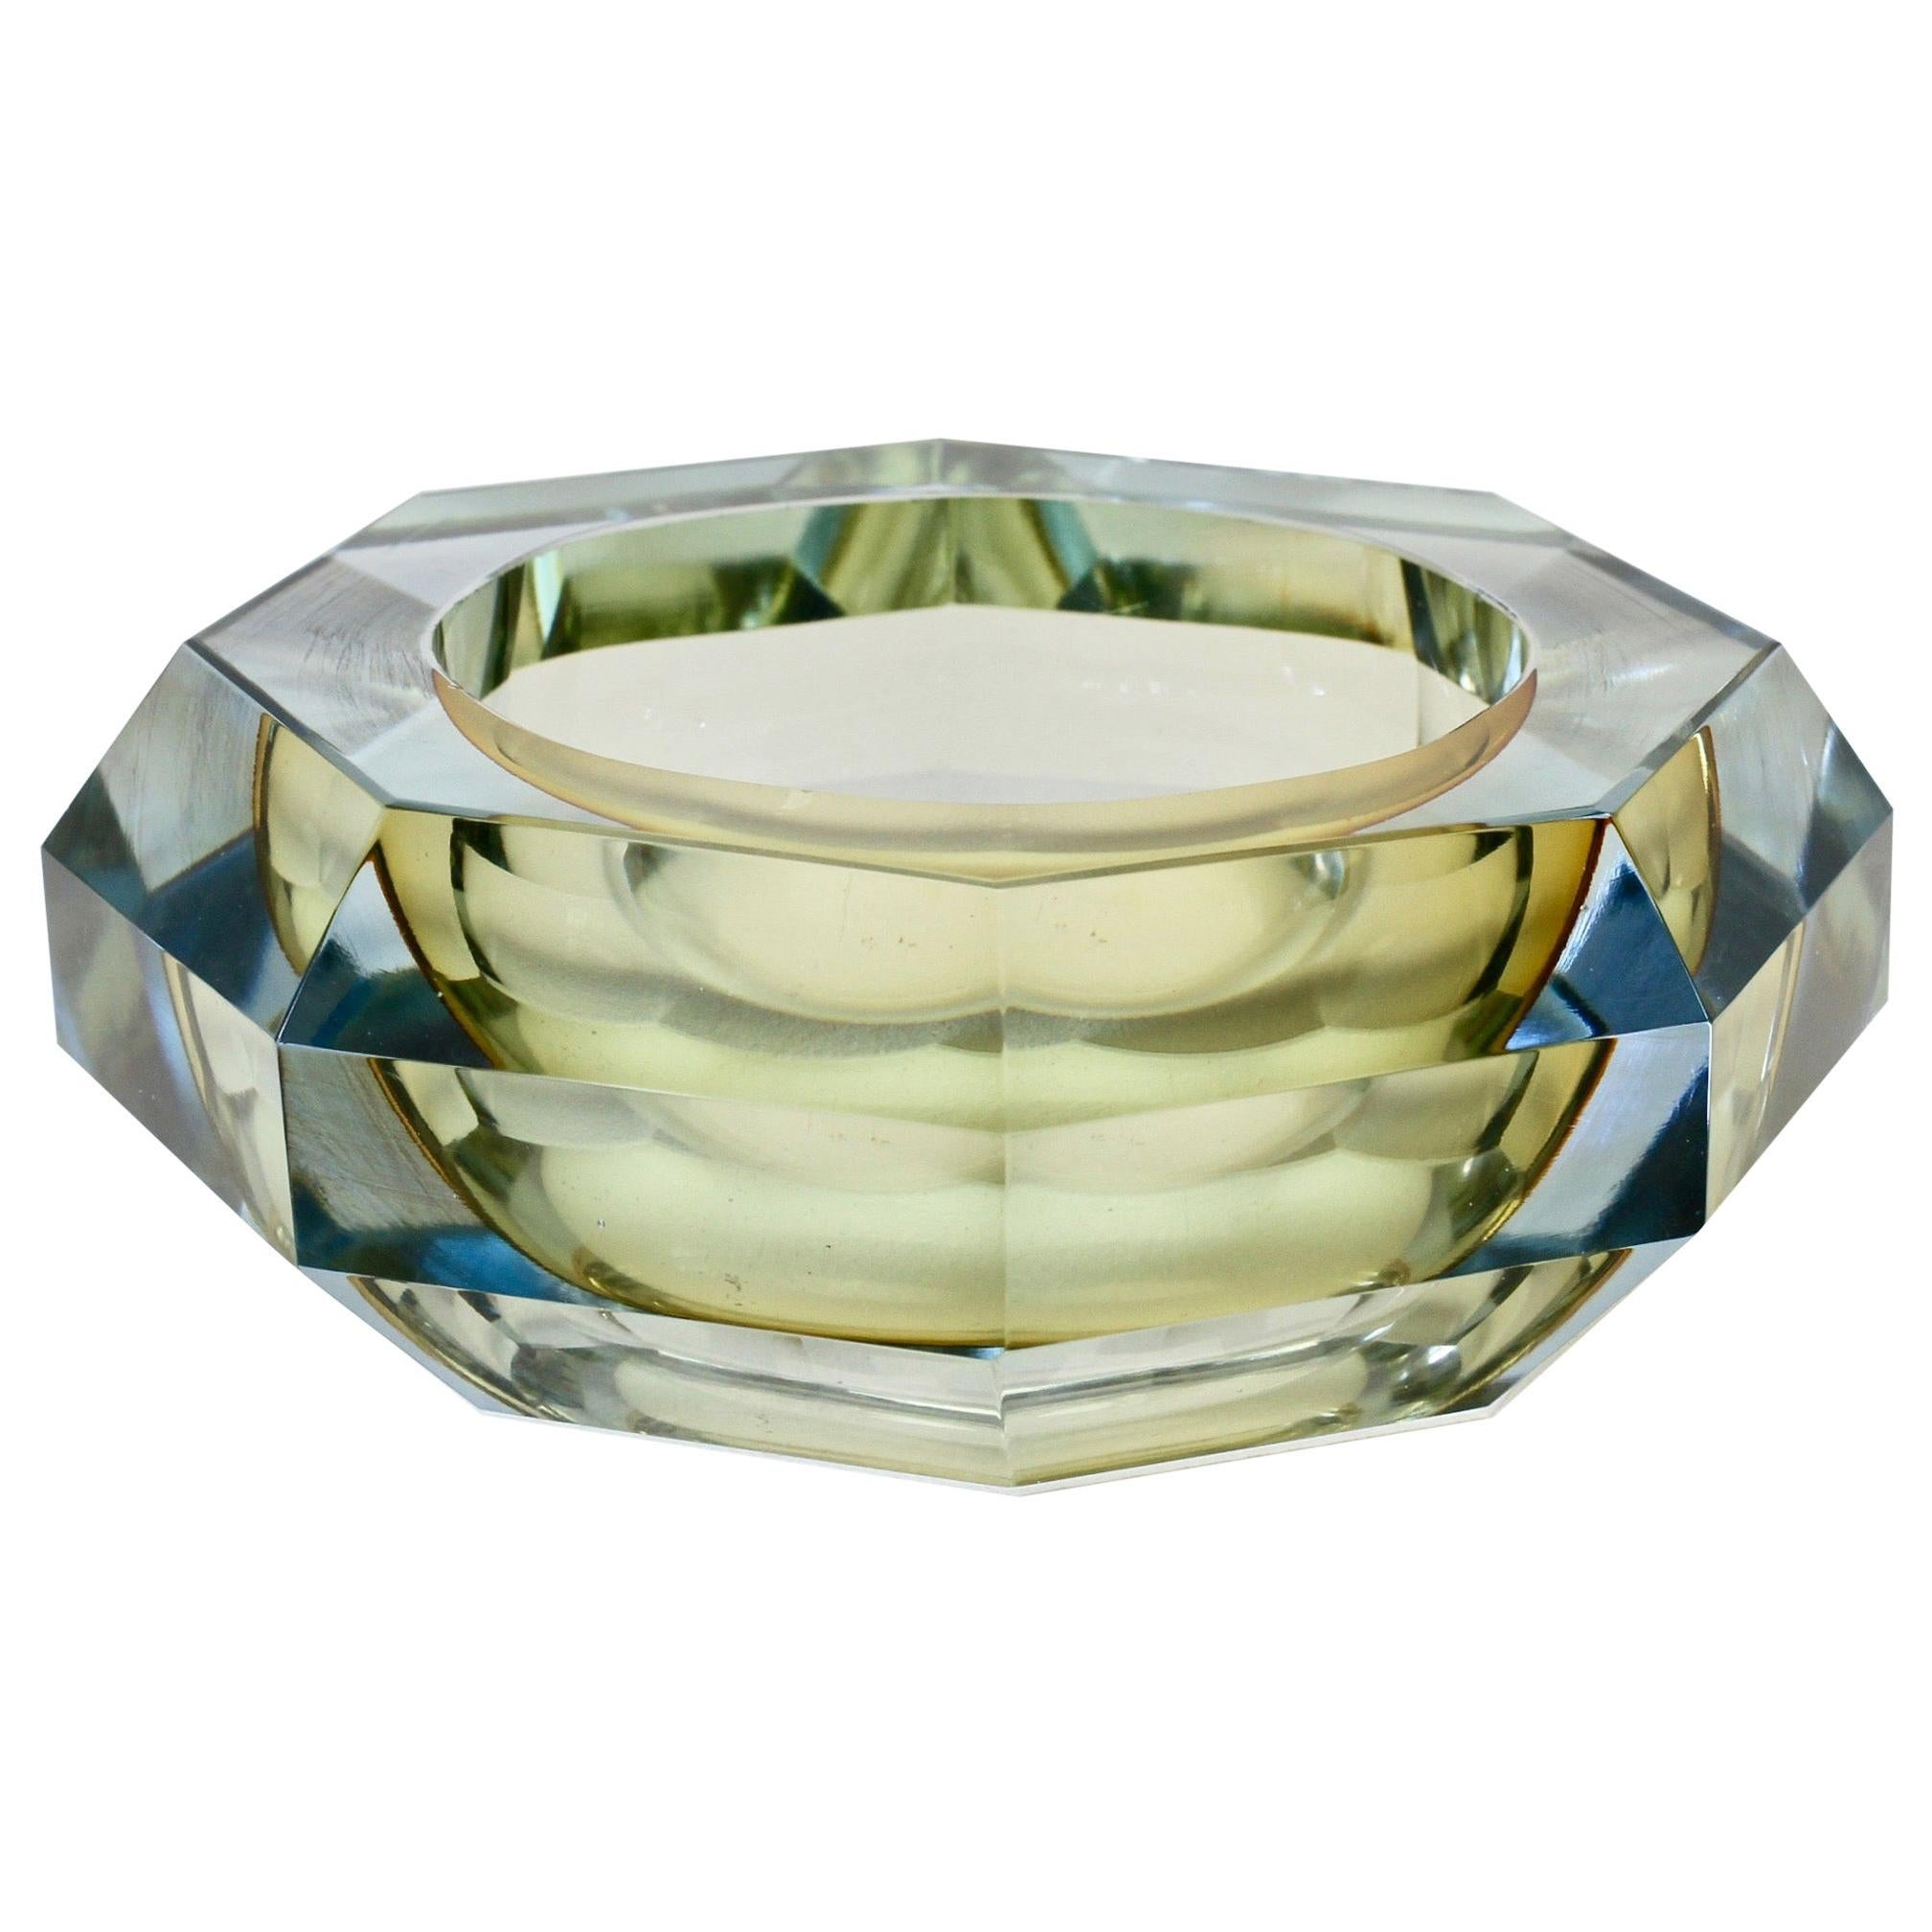 Faceted Murano Sommerso Diamond Cut Glass Bowl Attributed to Mandruzzato